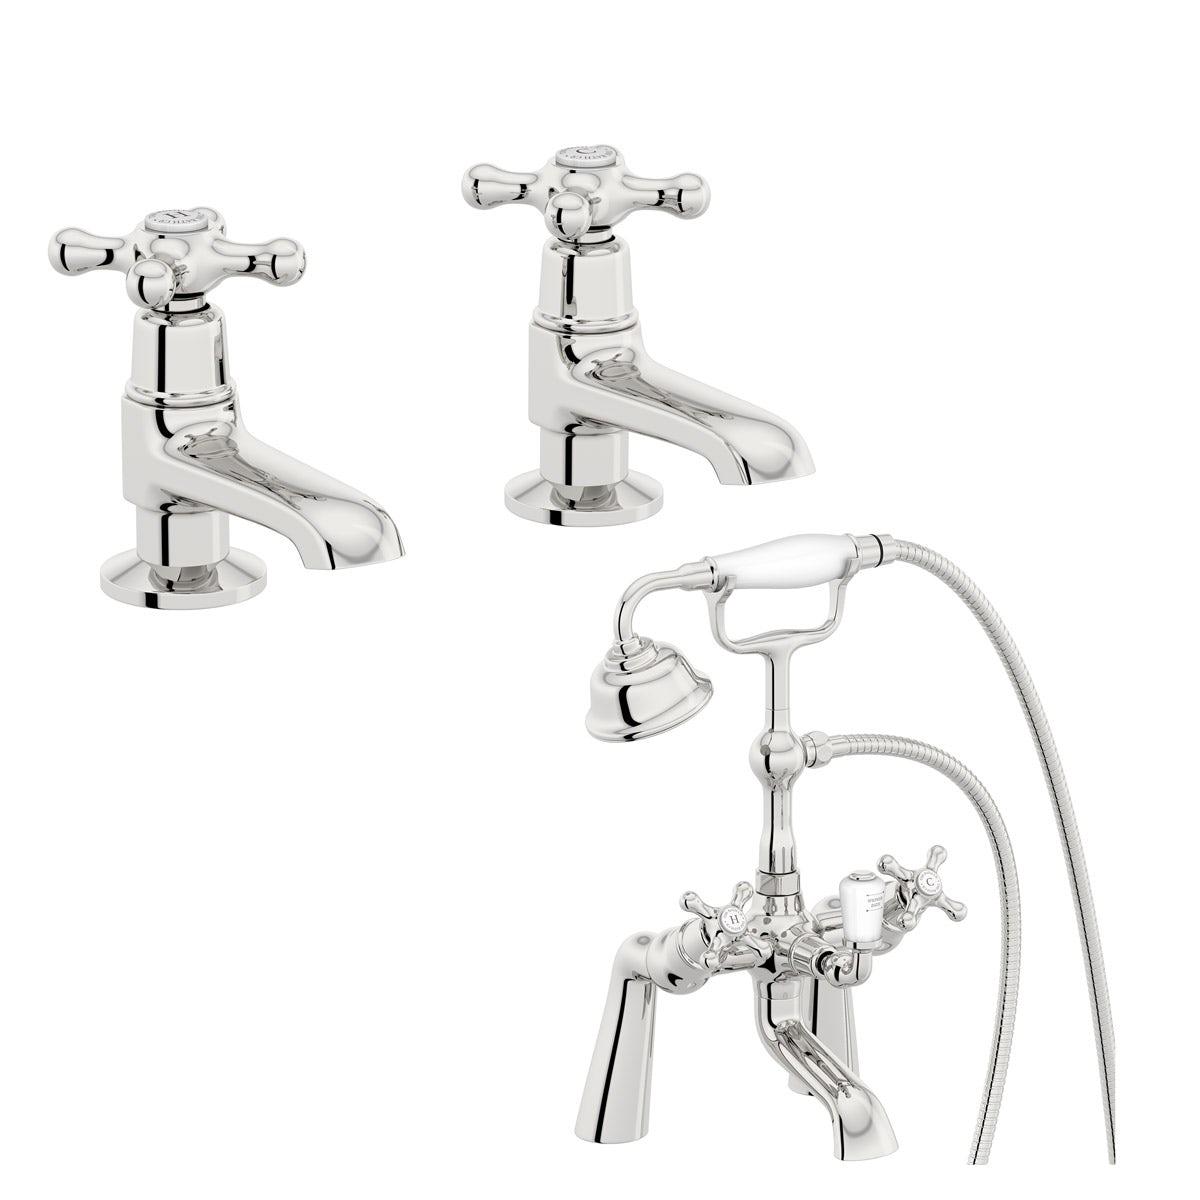 The Bath Co. Camberley basin pillar and bath shower mixer tap pack